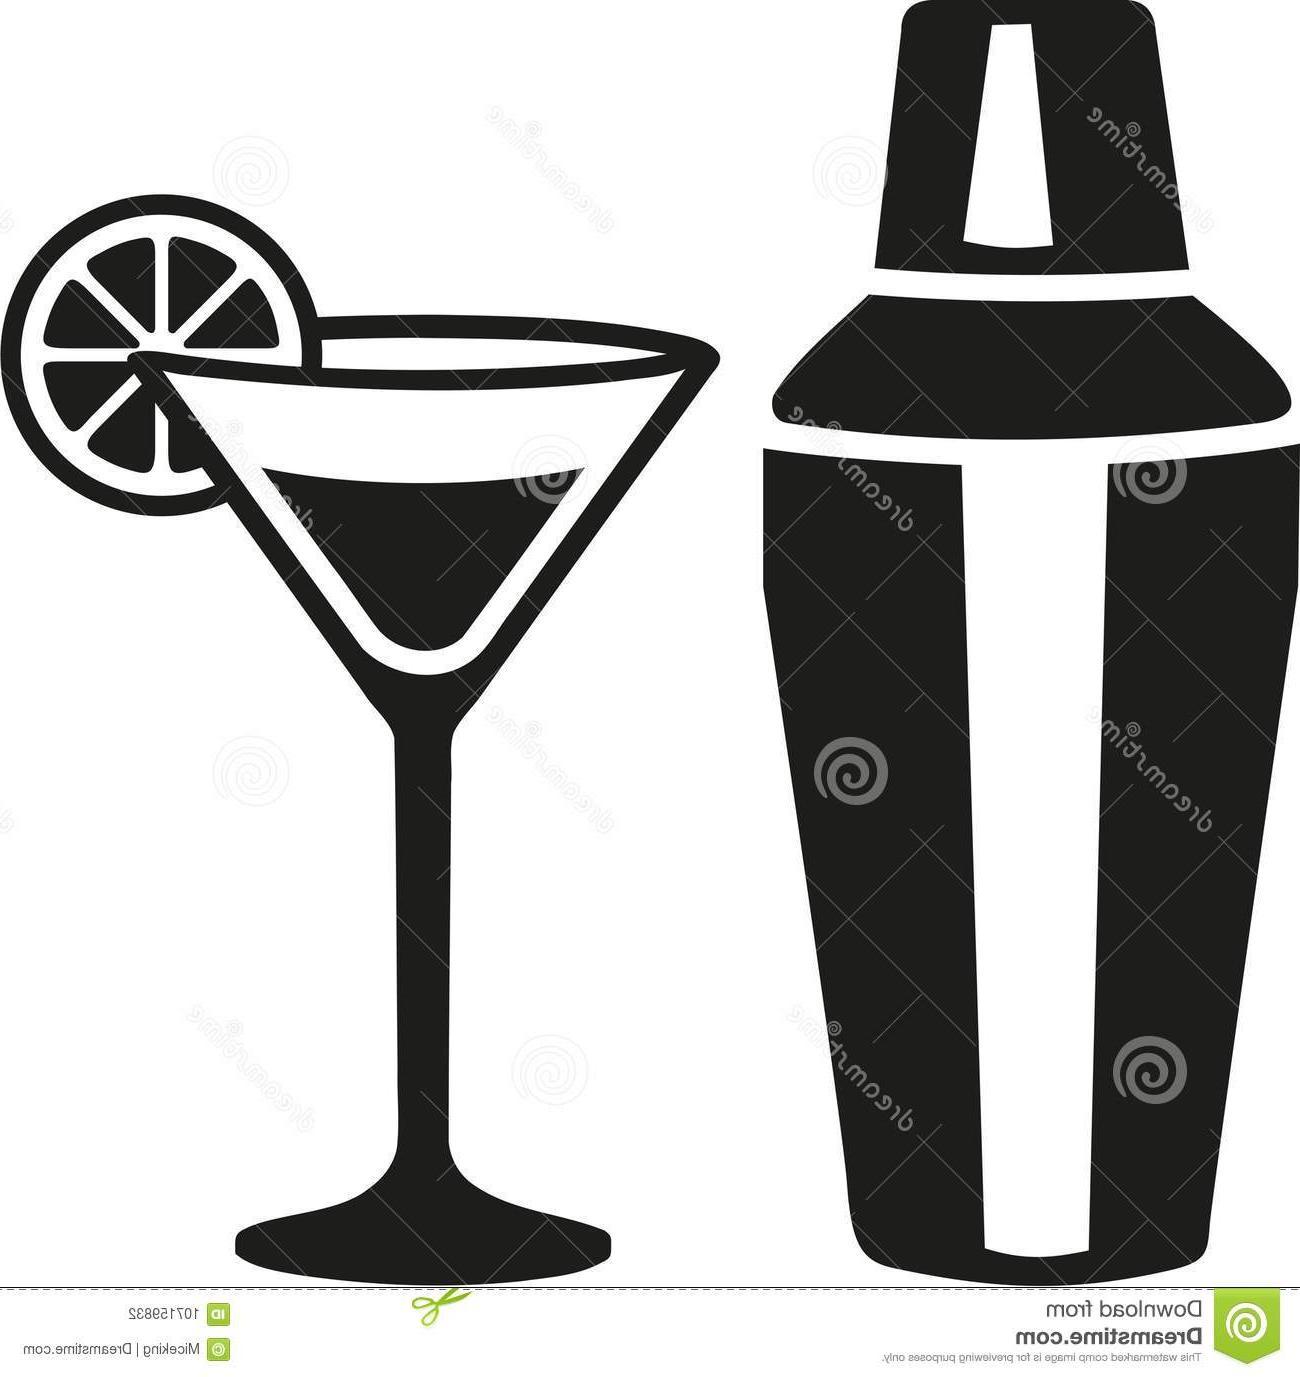 Unique Martini Cocktail Shaker Vector Image » Free Vector.